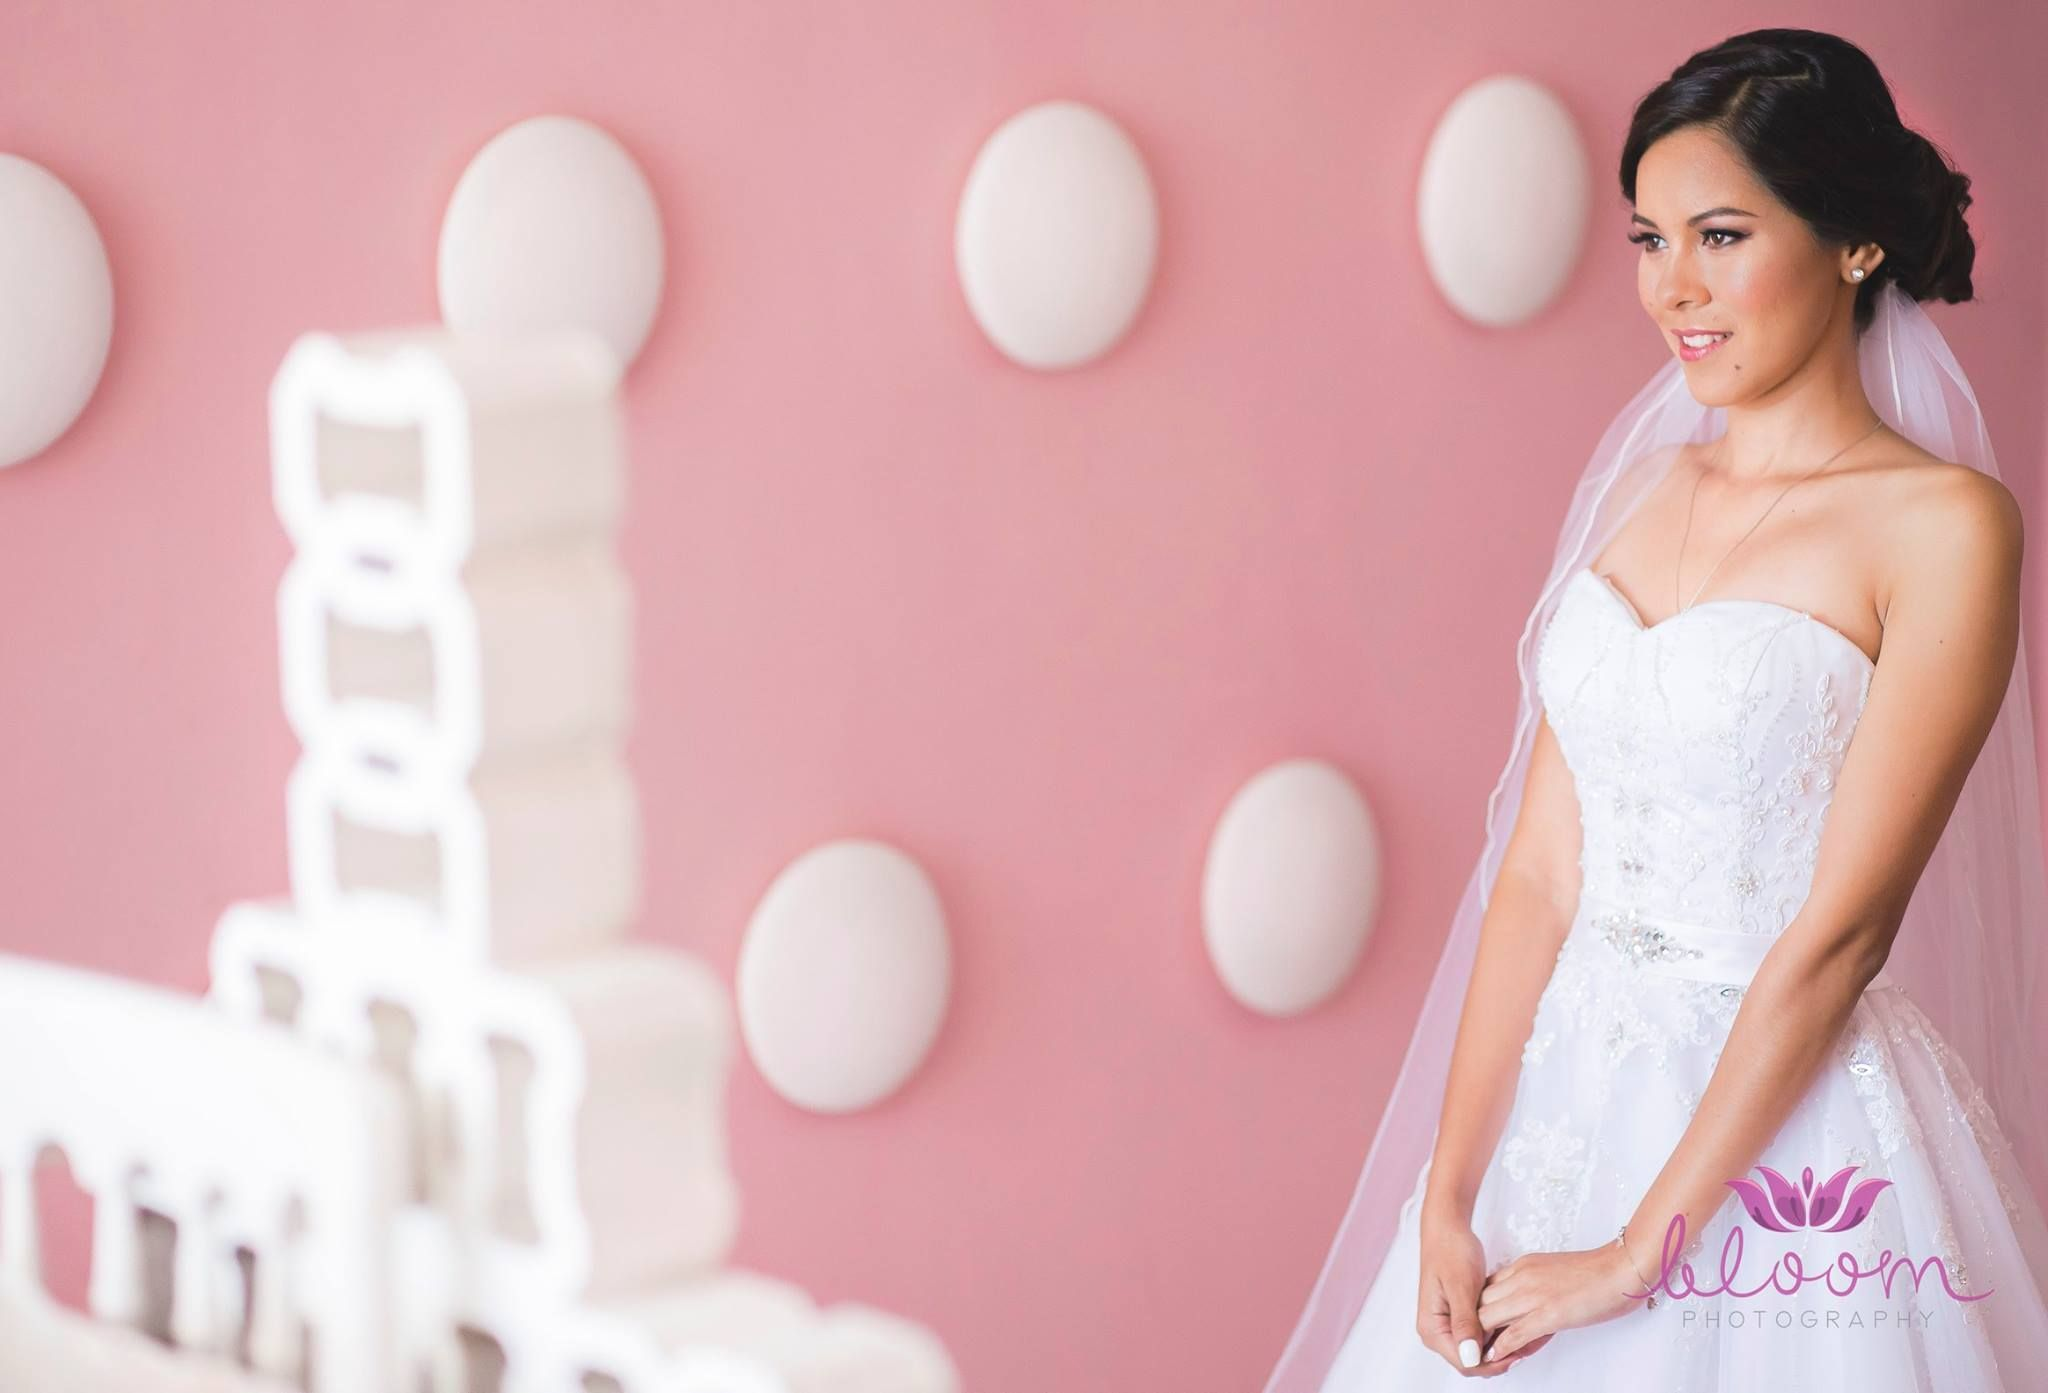 Asombroso Vestidos De Novia Veluz Imagen - Colección de Vestidos de ...